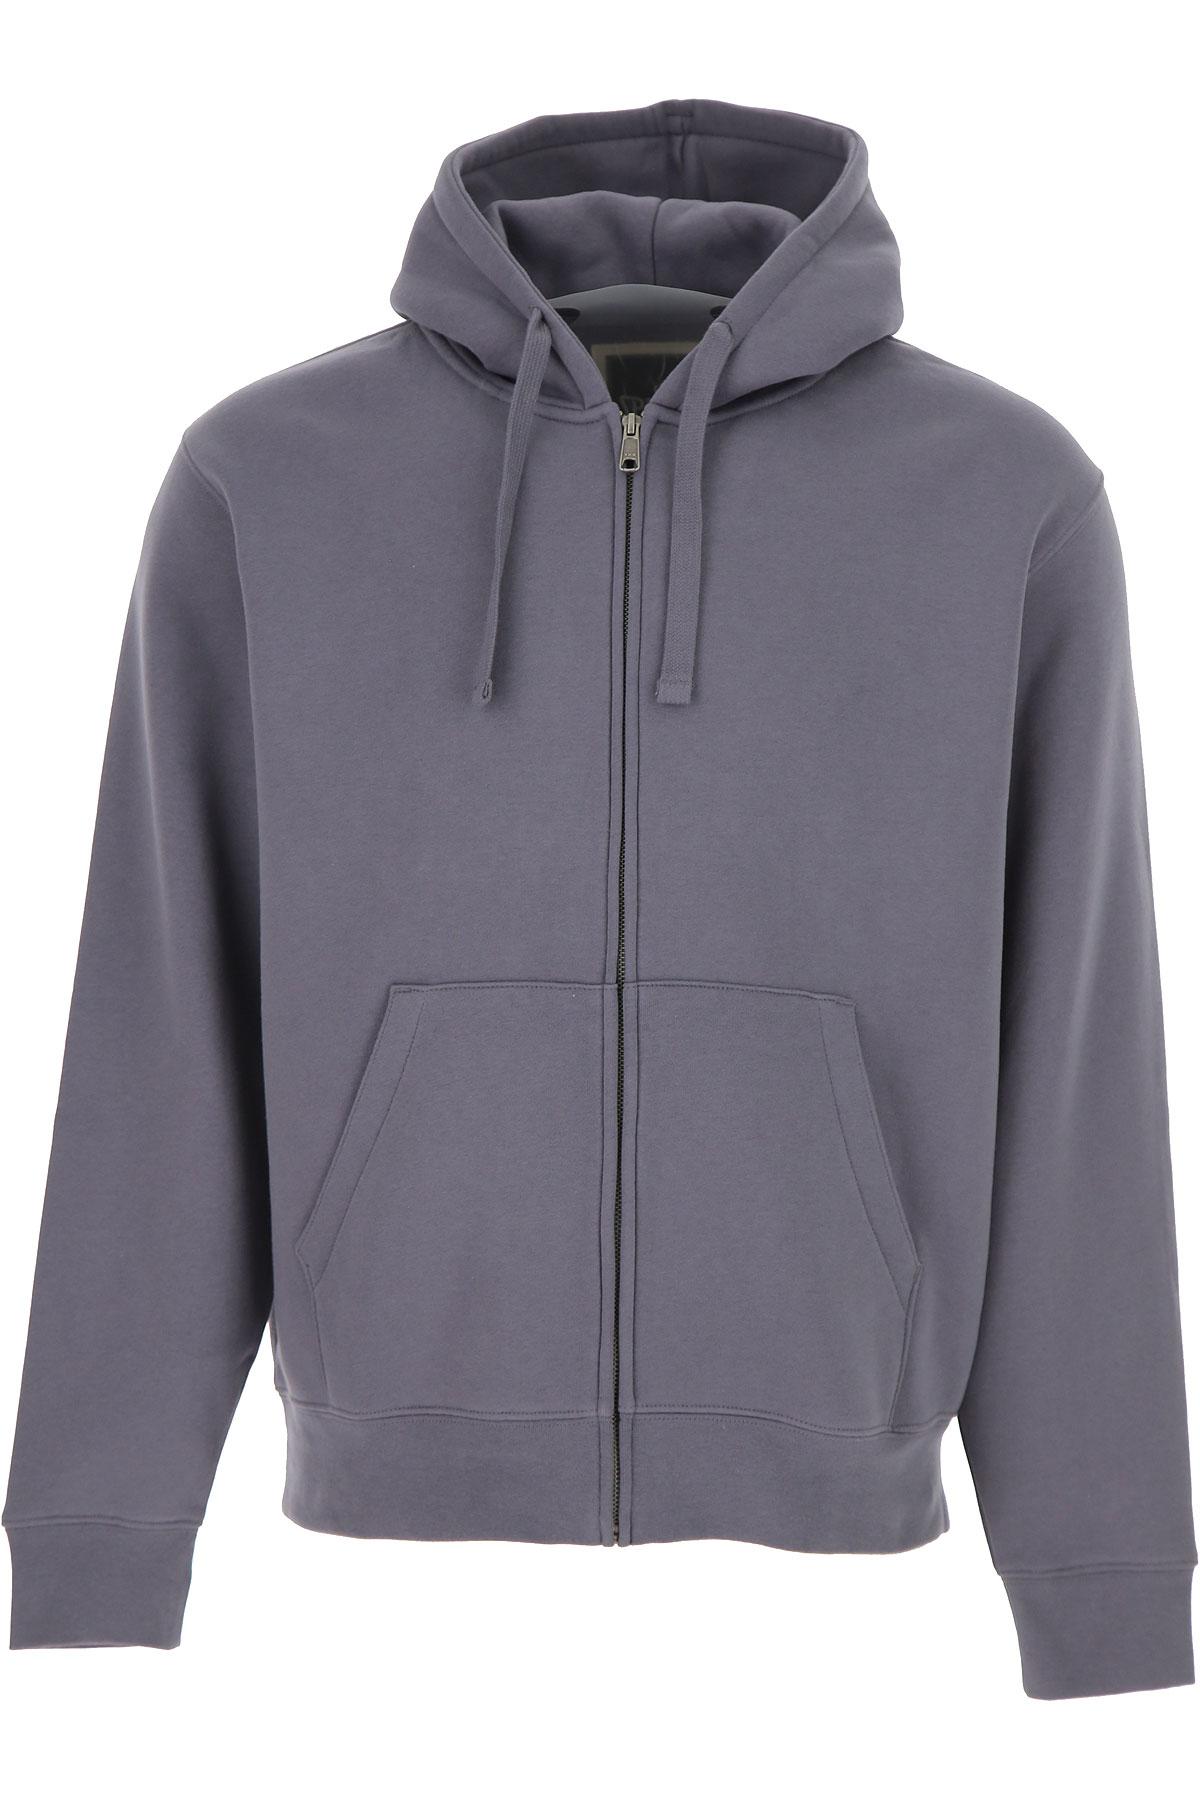 Spalding Sweatshirt for Men On Sale, Elephant Grey, Cotton, 2019, L M XL XXL